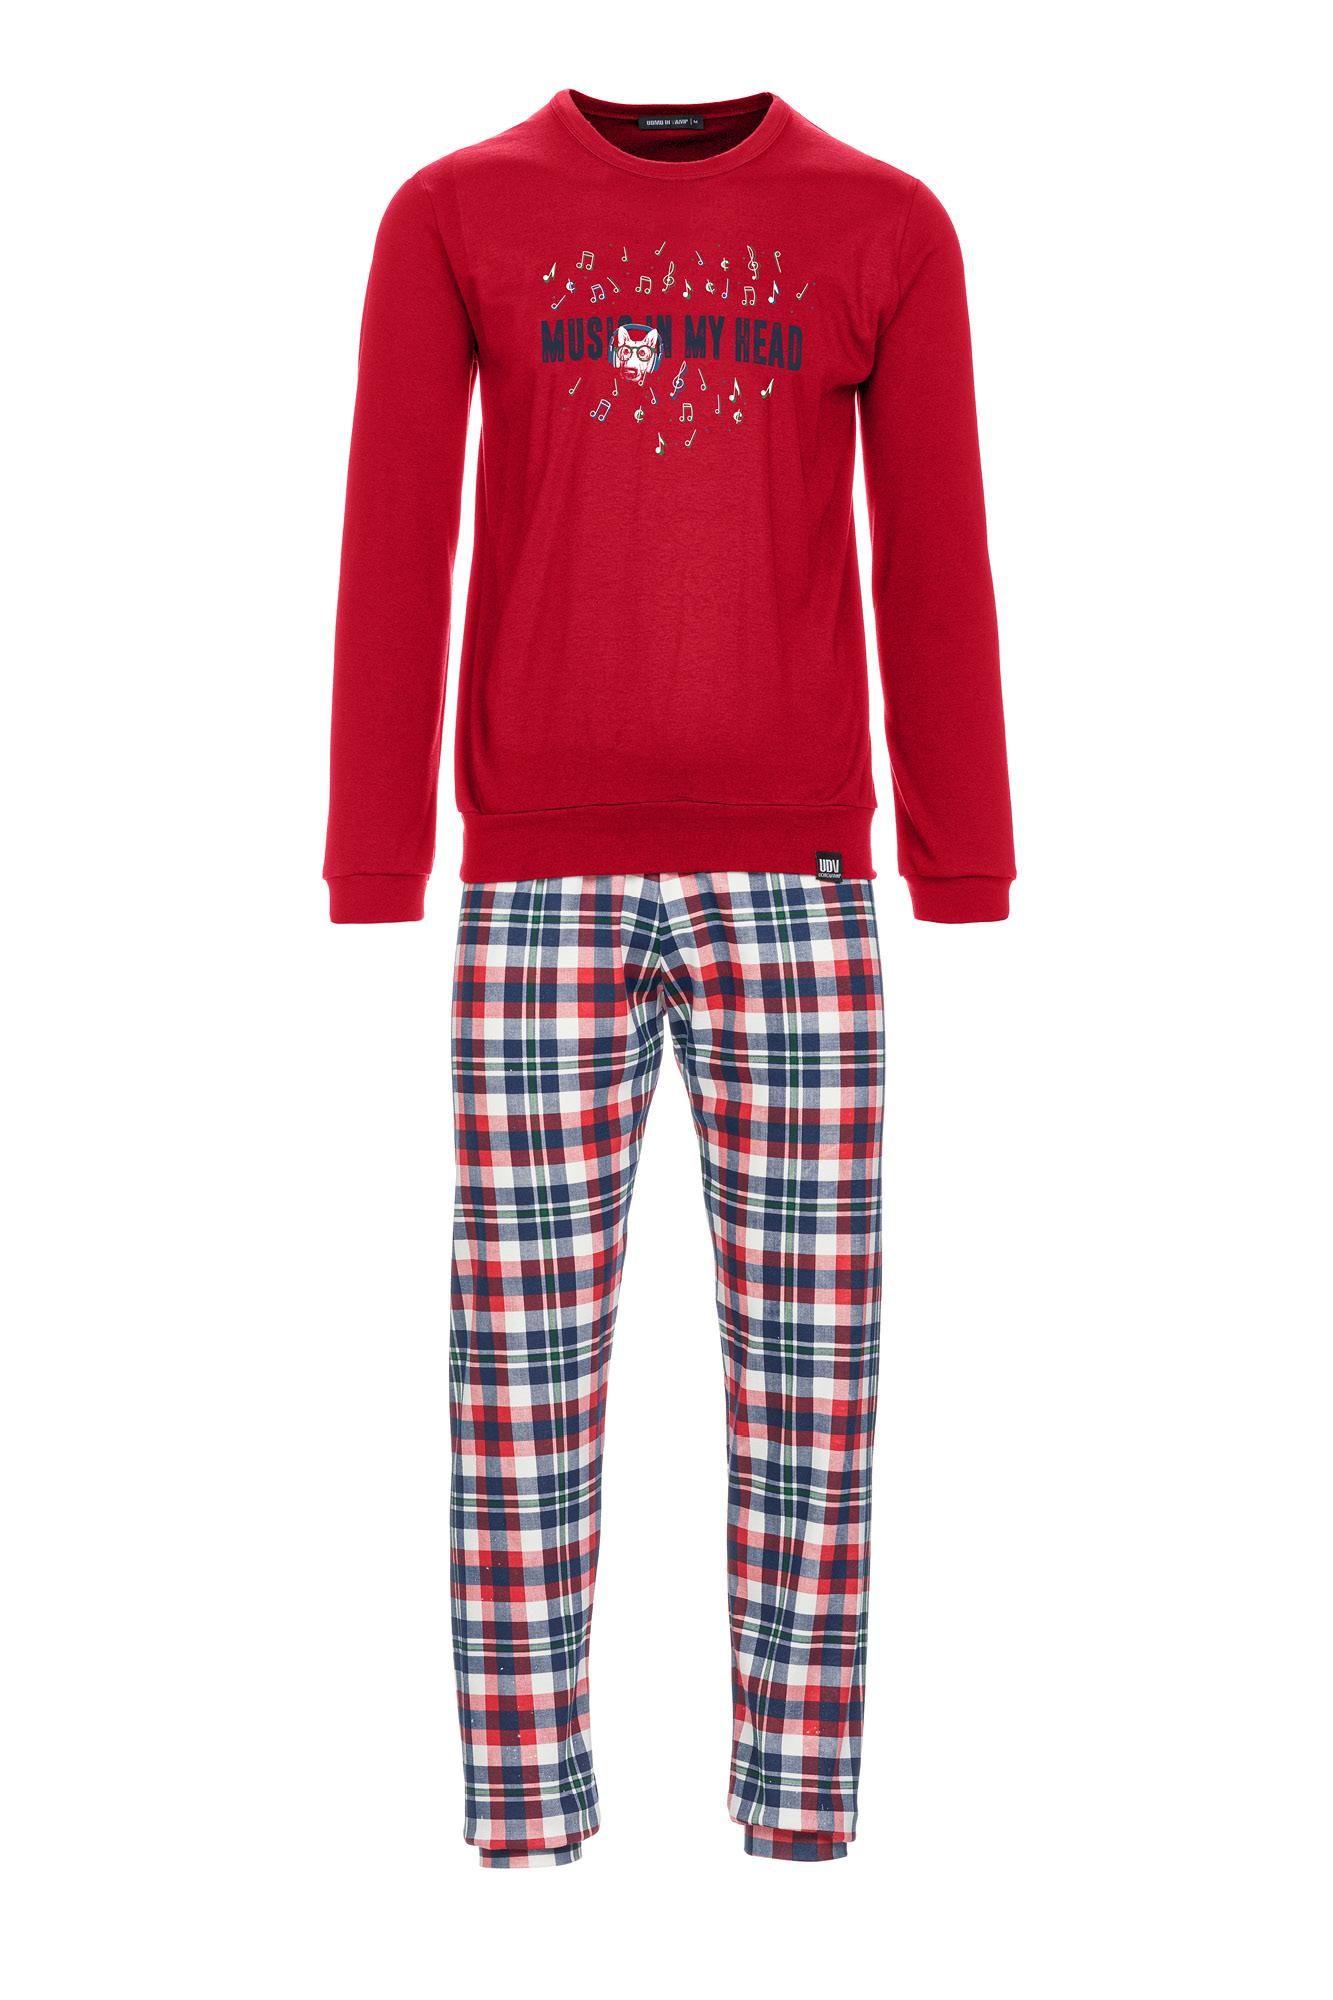 Men's Cotton Pyjamas Plus Size